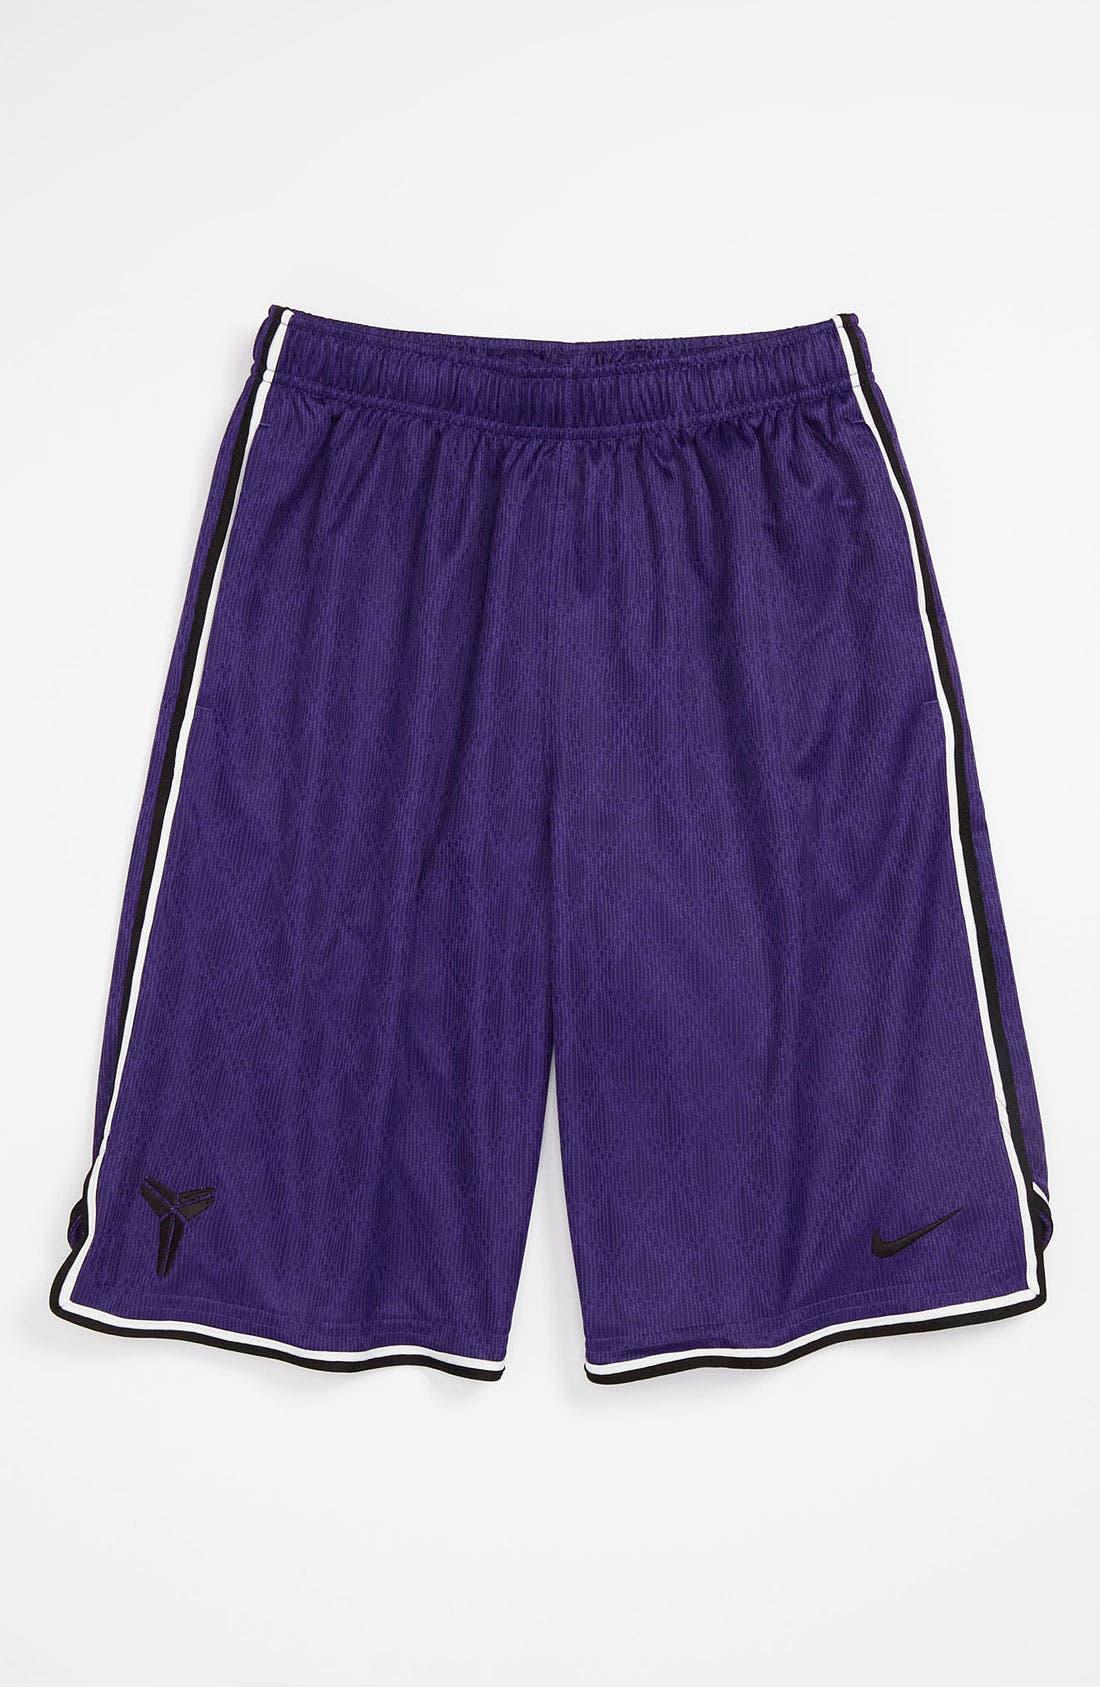 Main Image - Nike 'Kobe Essential' Shorts (Big Boys)